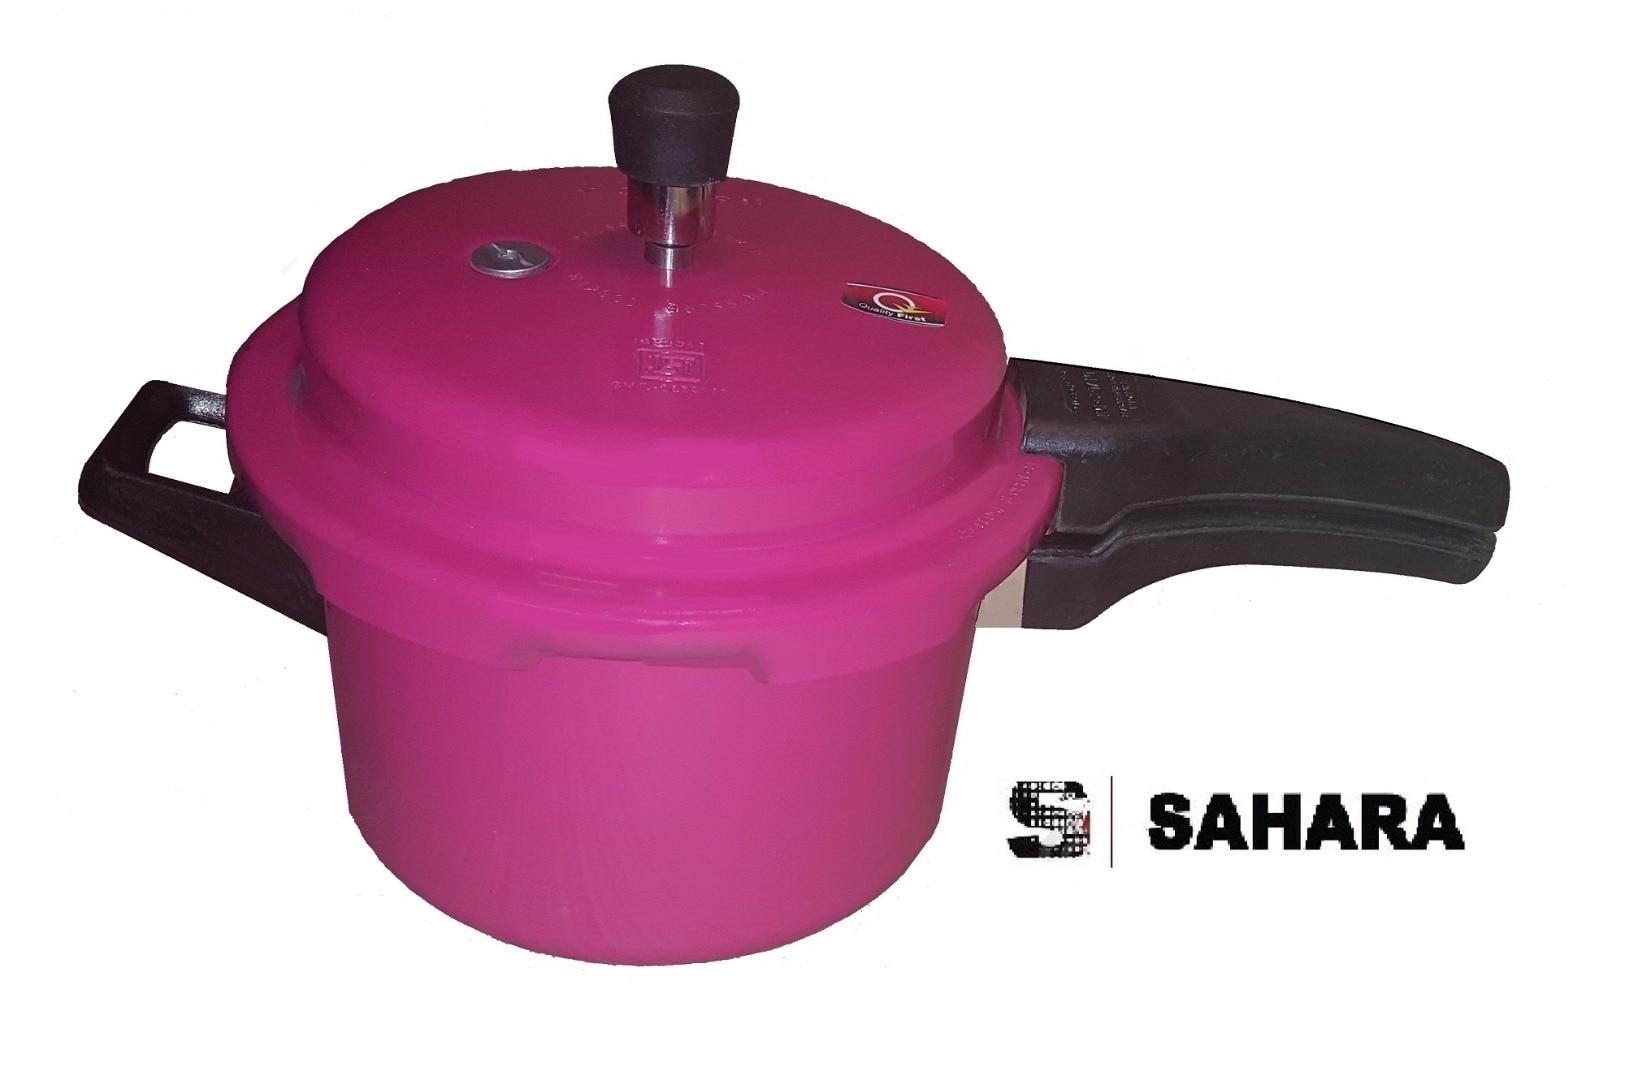 Sahara India Home Appliances